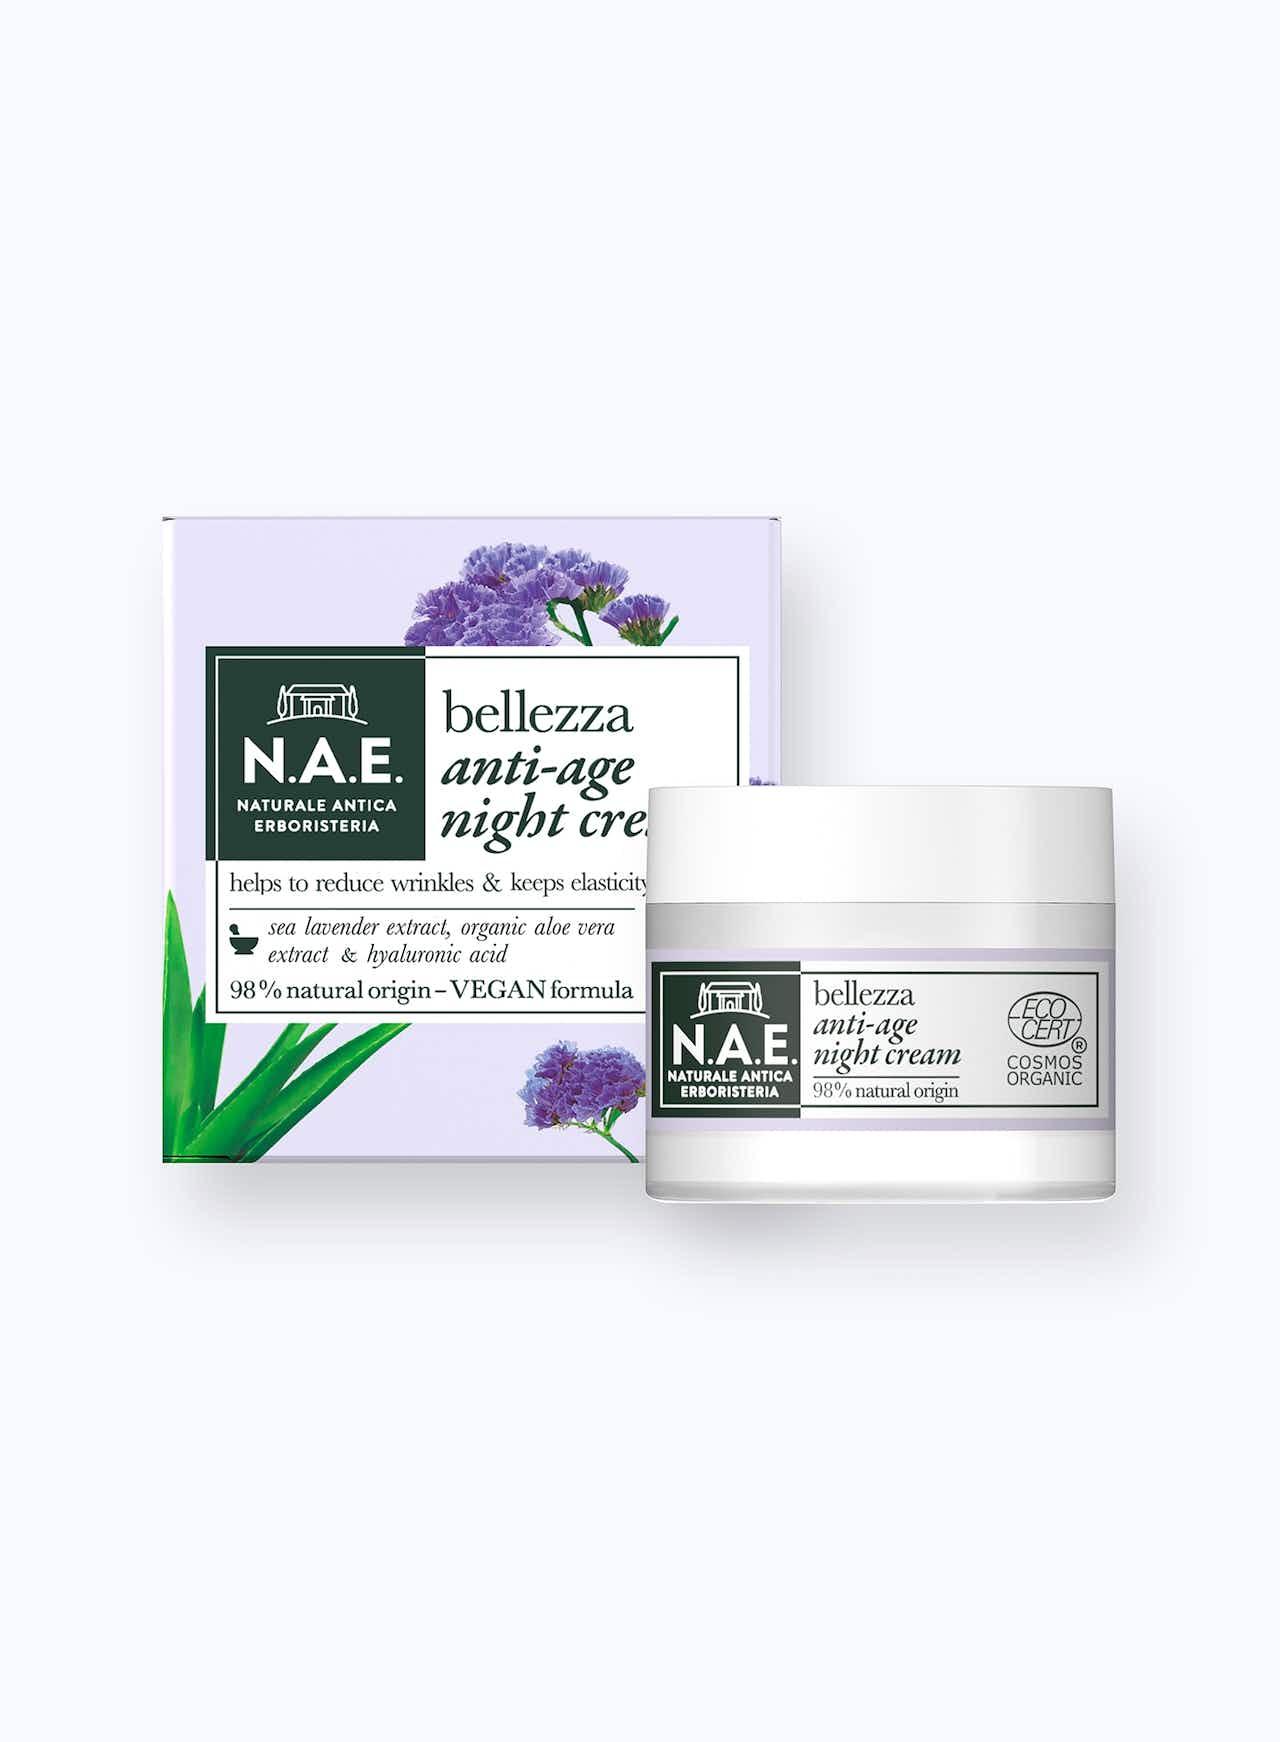 Anti-age Night Cream, 50ml